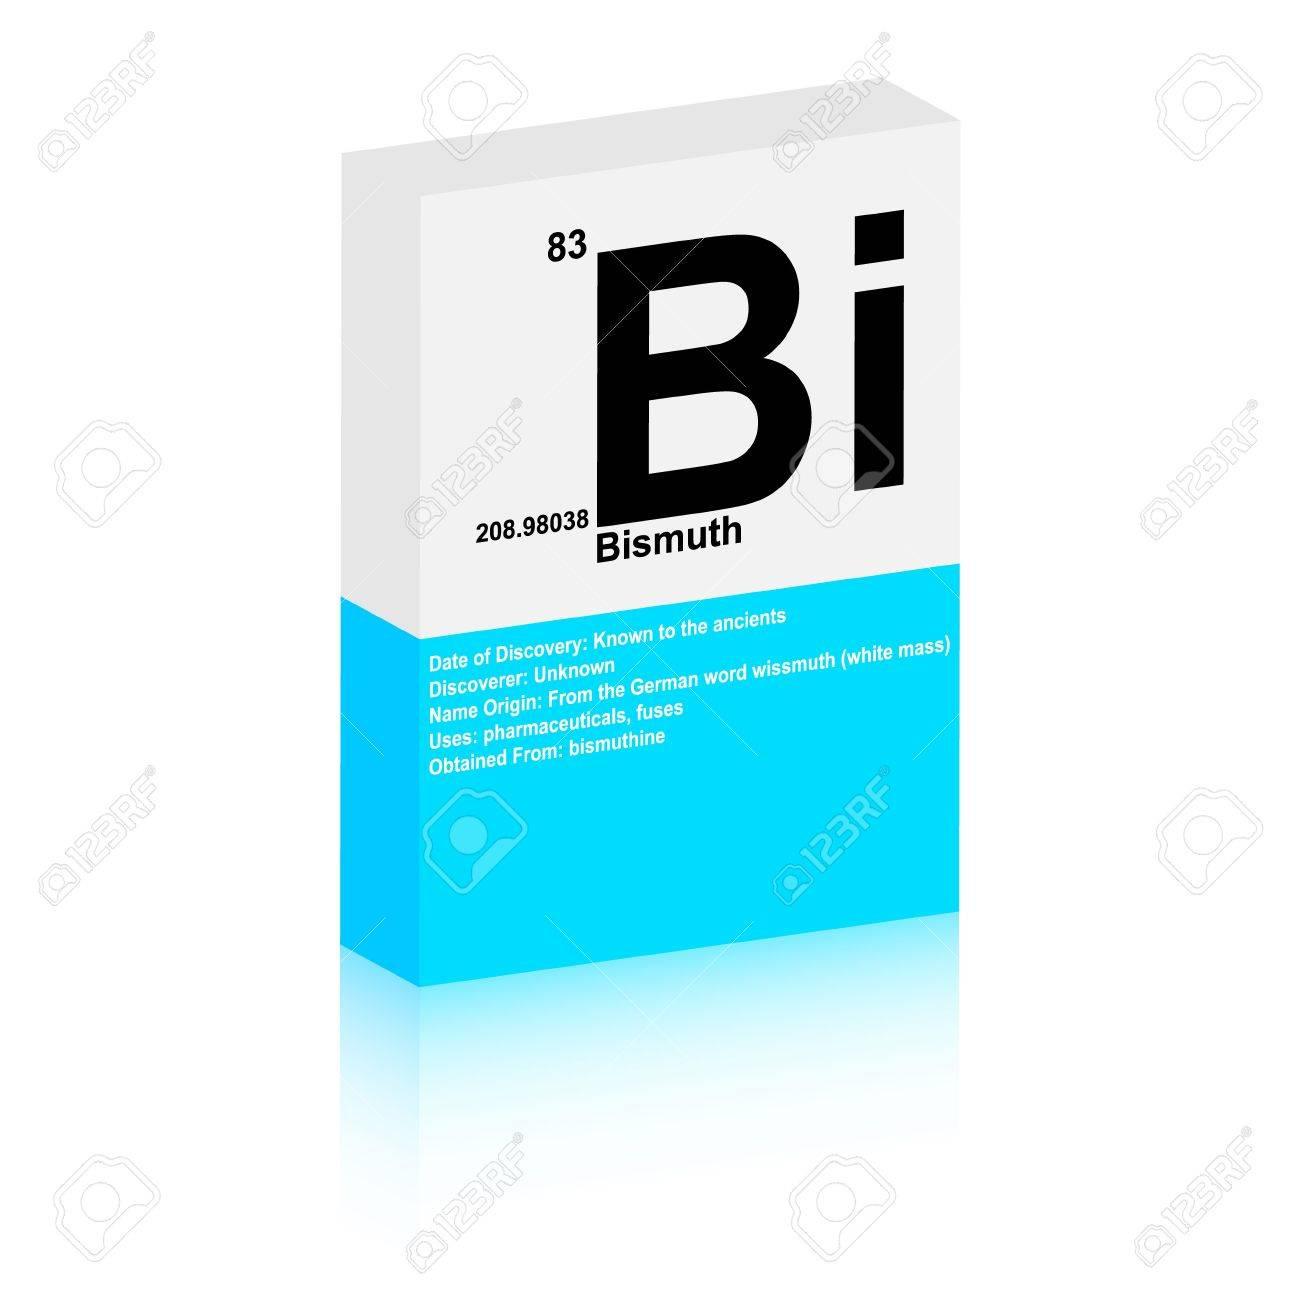 bismuth symbol Stock Vector - 13345226